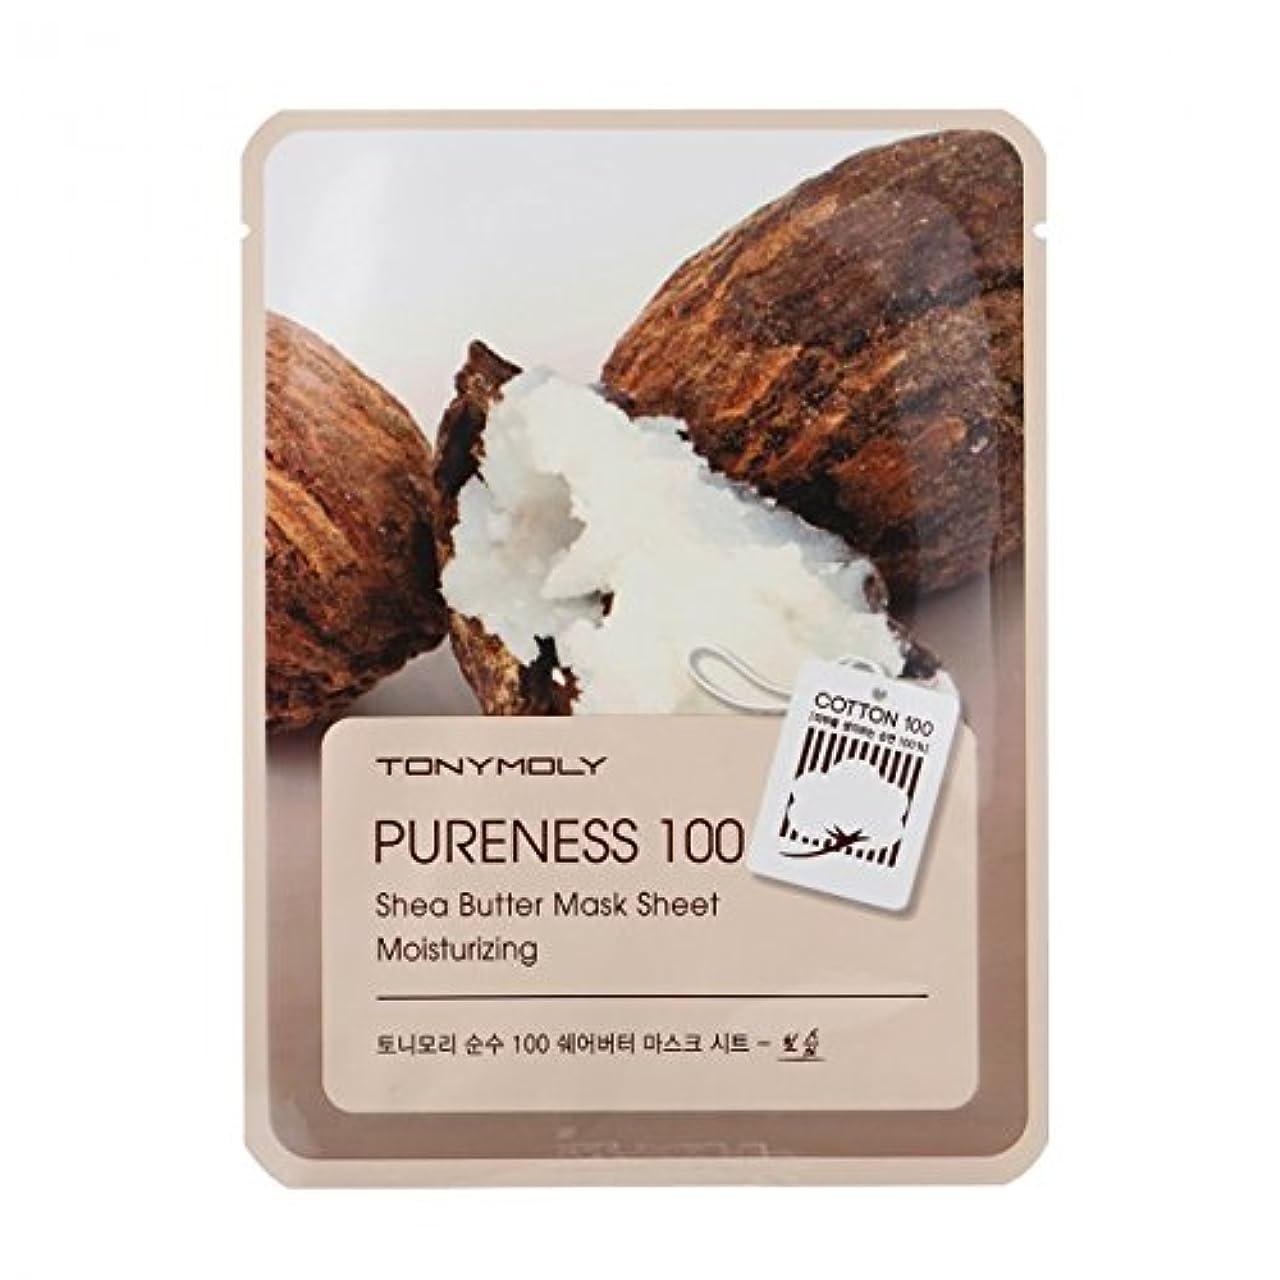 (6 Pack) TONYMOLY Pureness 100 Shea Butter Mask Sheet Moisturizing (並行輸入品)